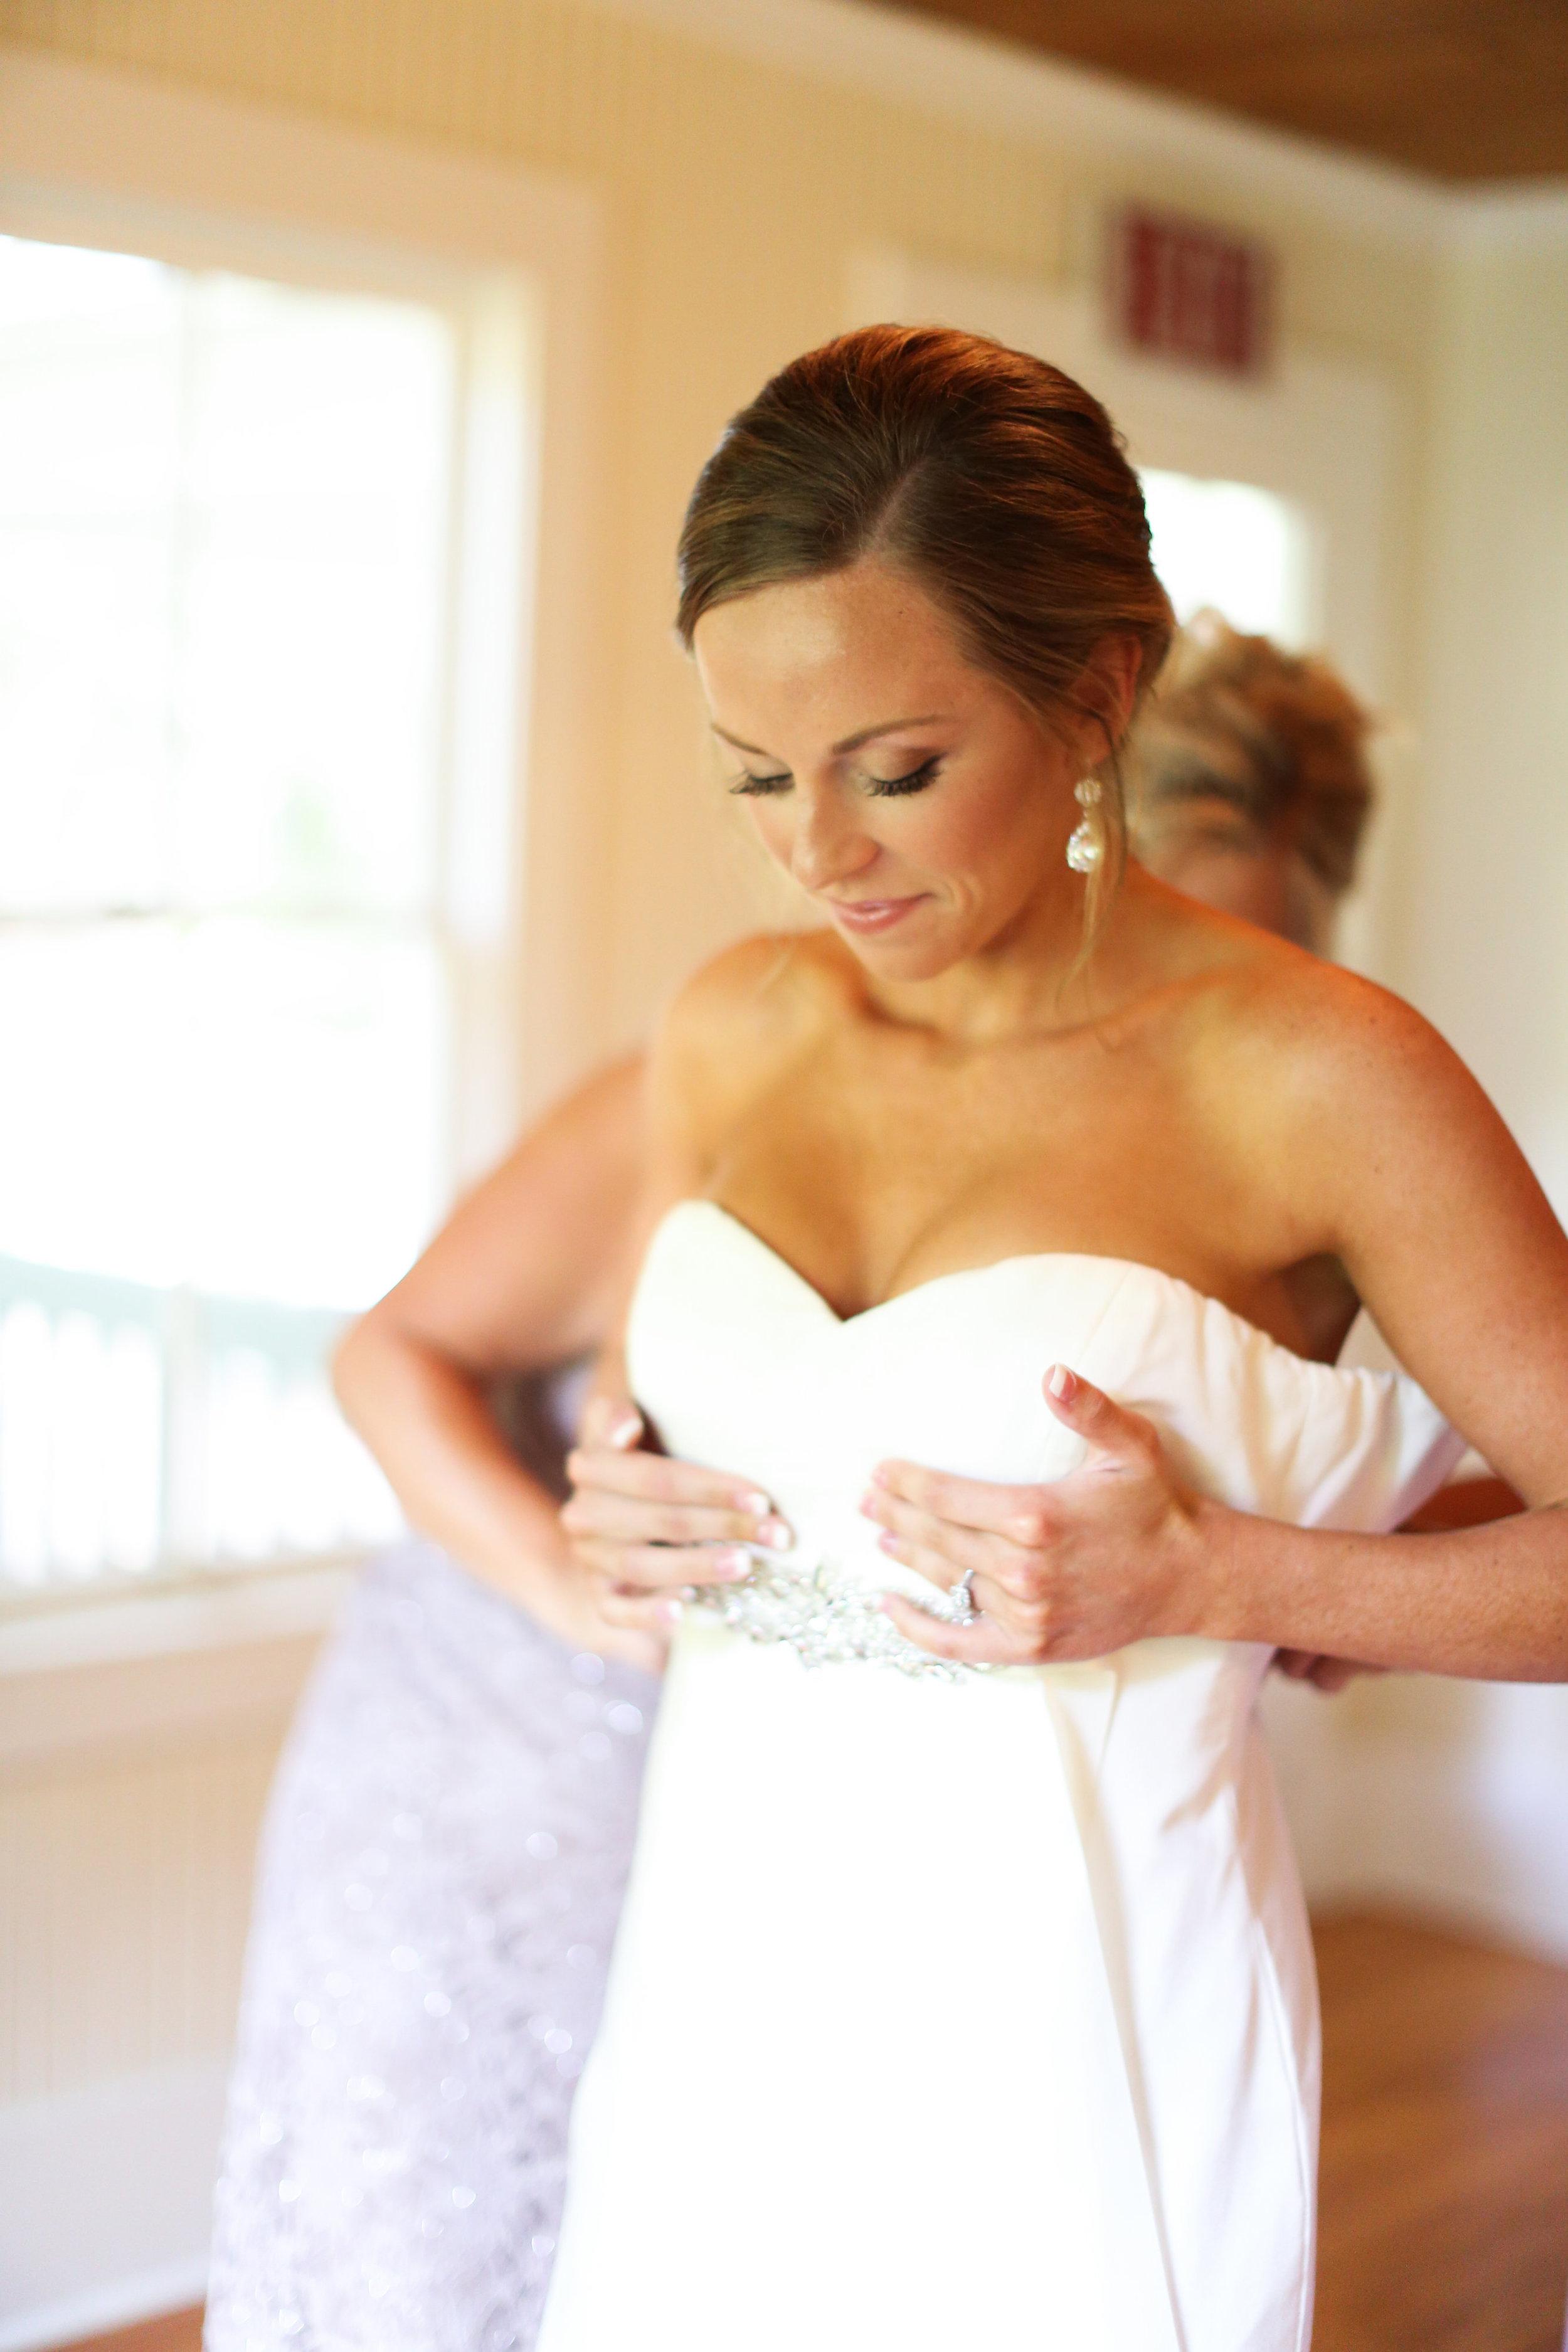 finnegan-photography-ivory-and-beau-bridal-boutique-nicole-miller-dakota-jaclyn-jordan-anne-veil-savannah-bridal-boutique-savannah-wedding-dresses-savannah-weddings-statesboro-wedding-barn-wedding-savannah-bridal-georgia-bridal-boutique-4.jpg